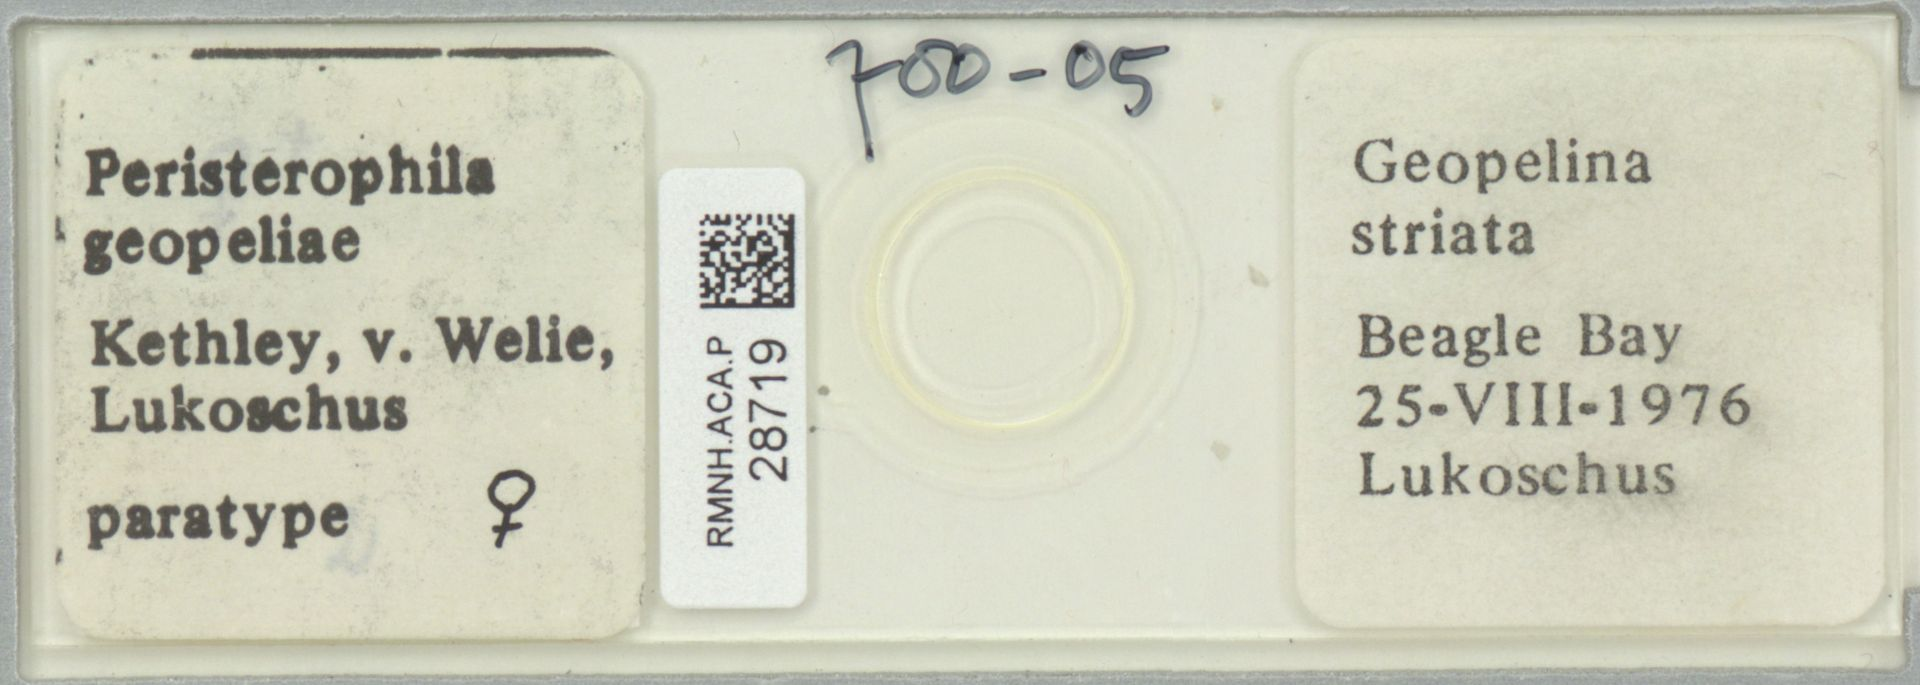 RMNH.ACA.P.28719 | Peristerophila geopeliae Kethley, v. Welie, Lukoschus